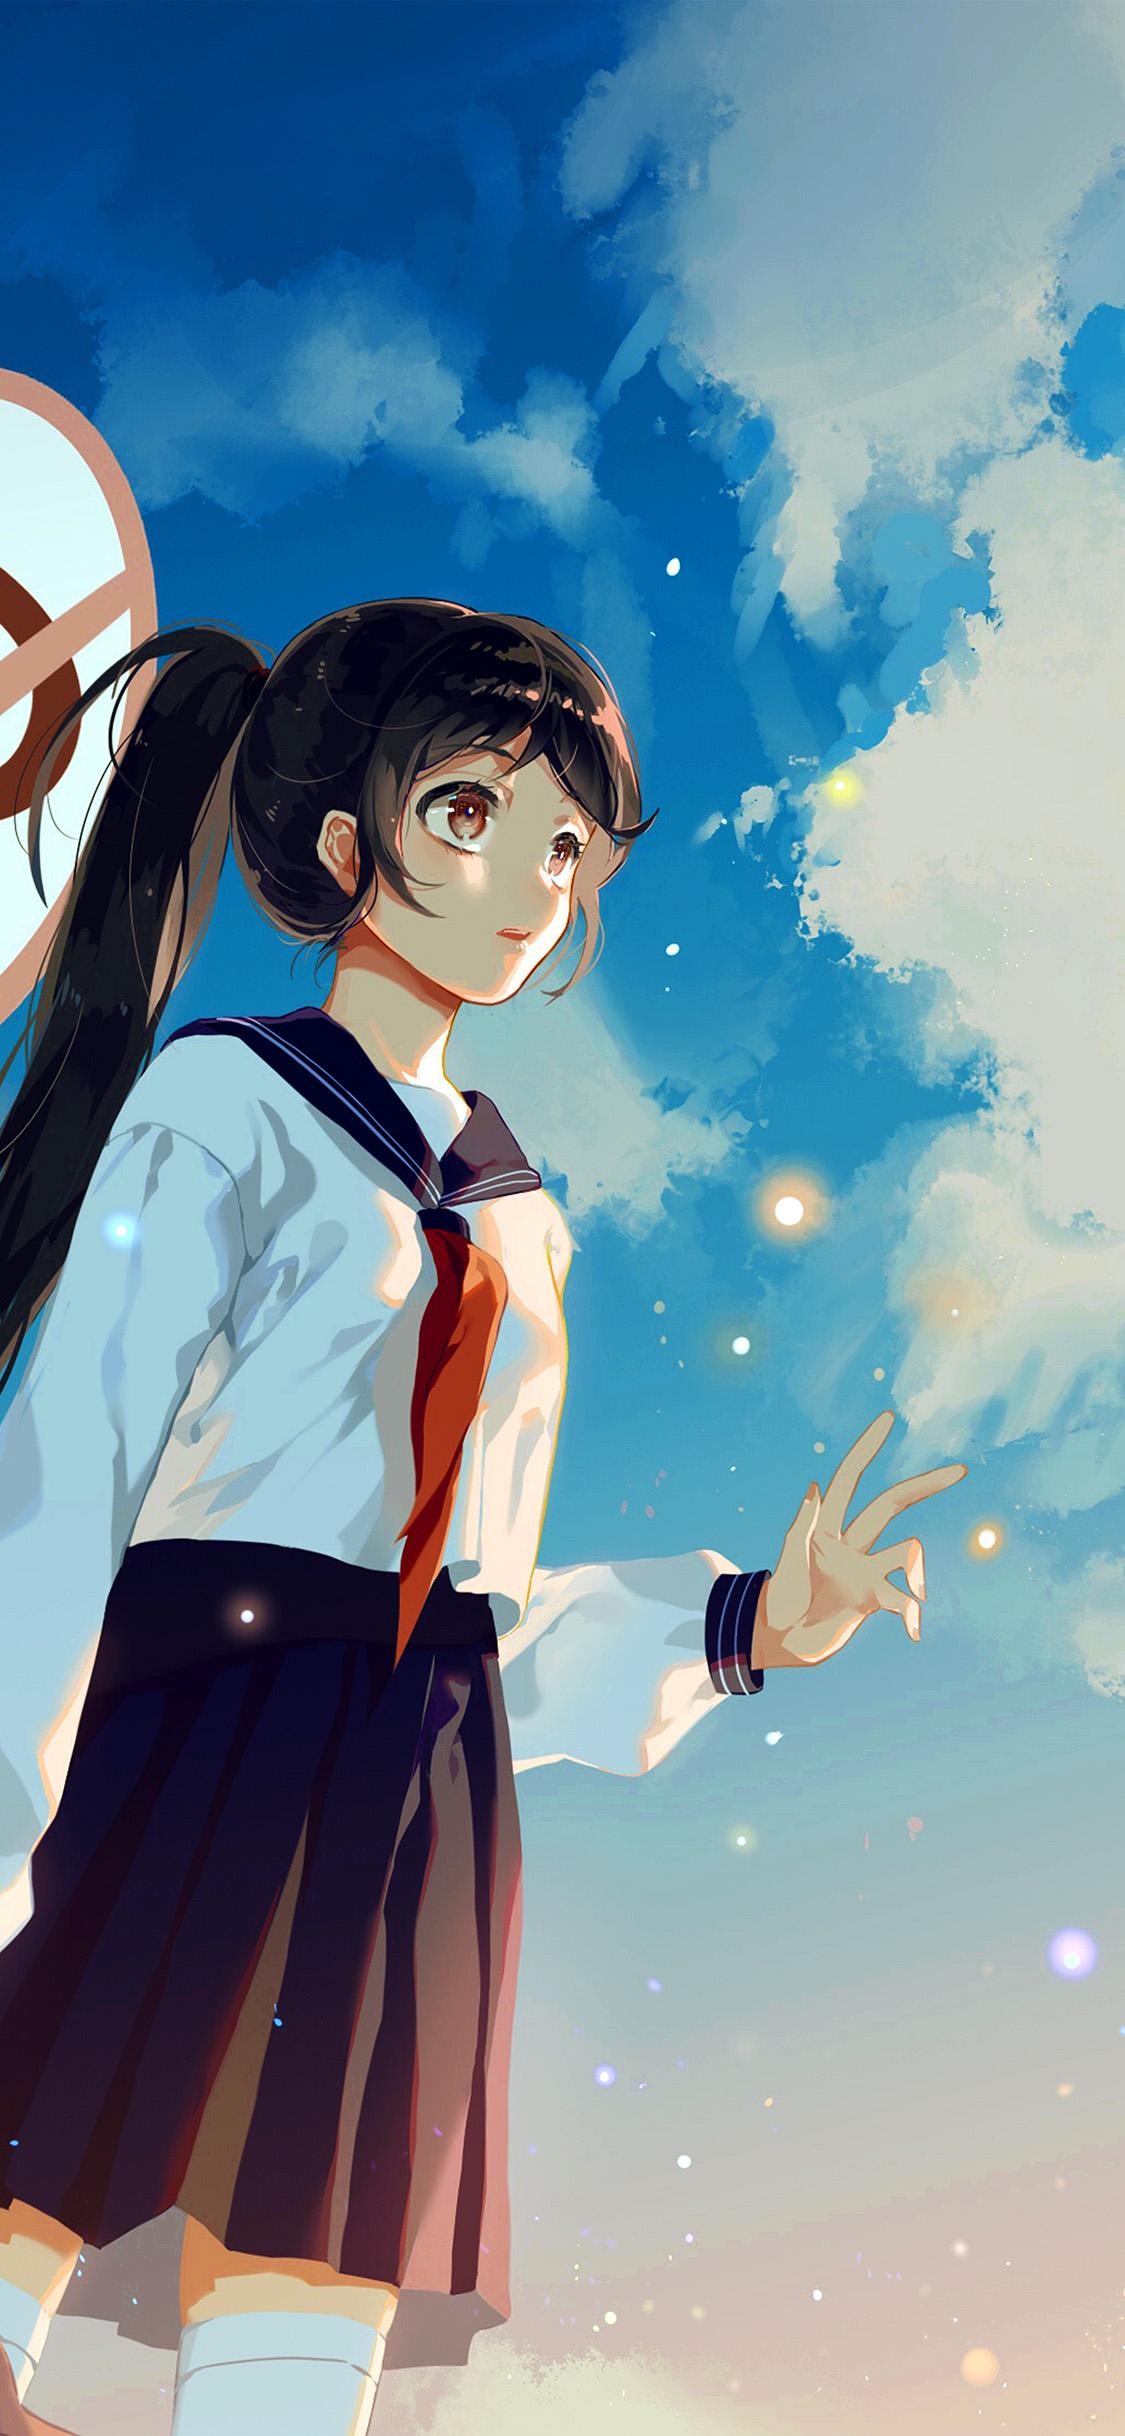 iPhonexpapers.com-Apple-iPhone-wallpaper-bc67-girl-school-girl-anime-sky-cloud-star-art-illustration